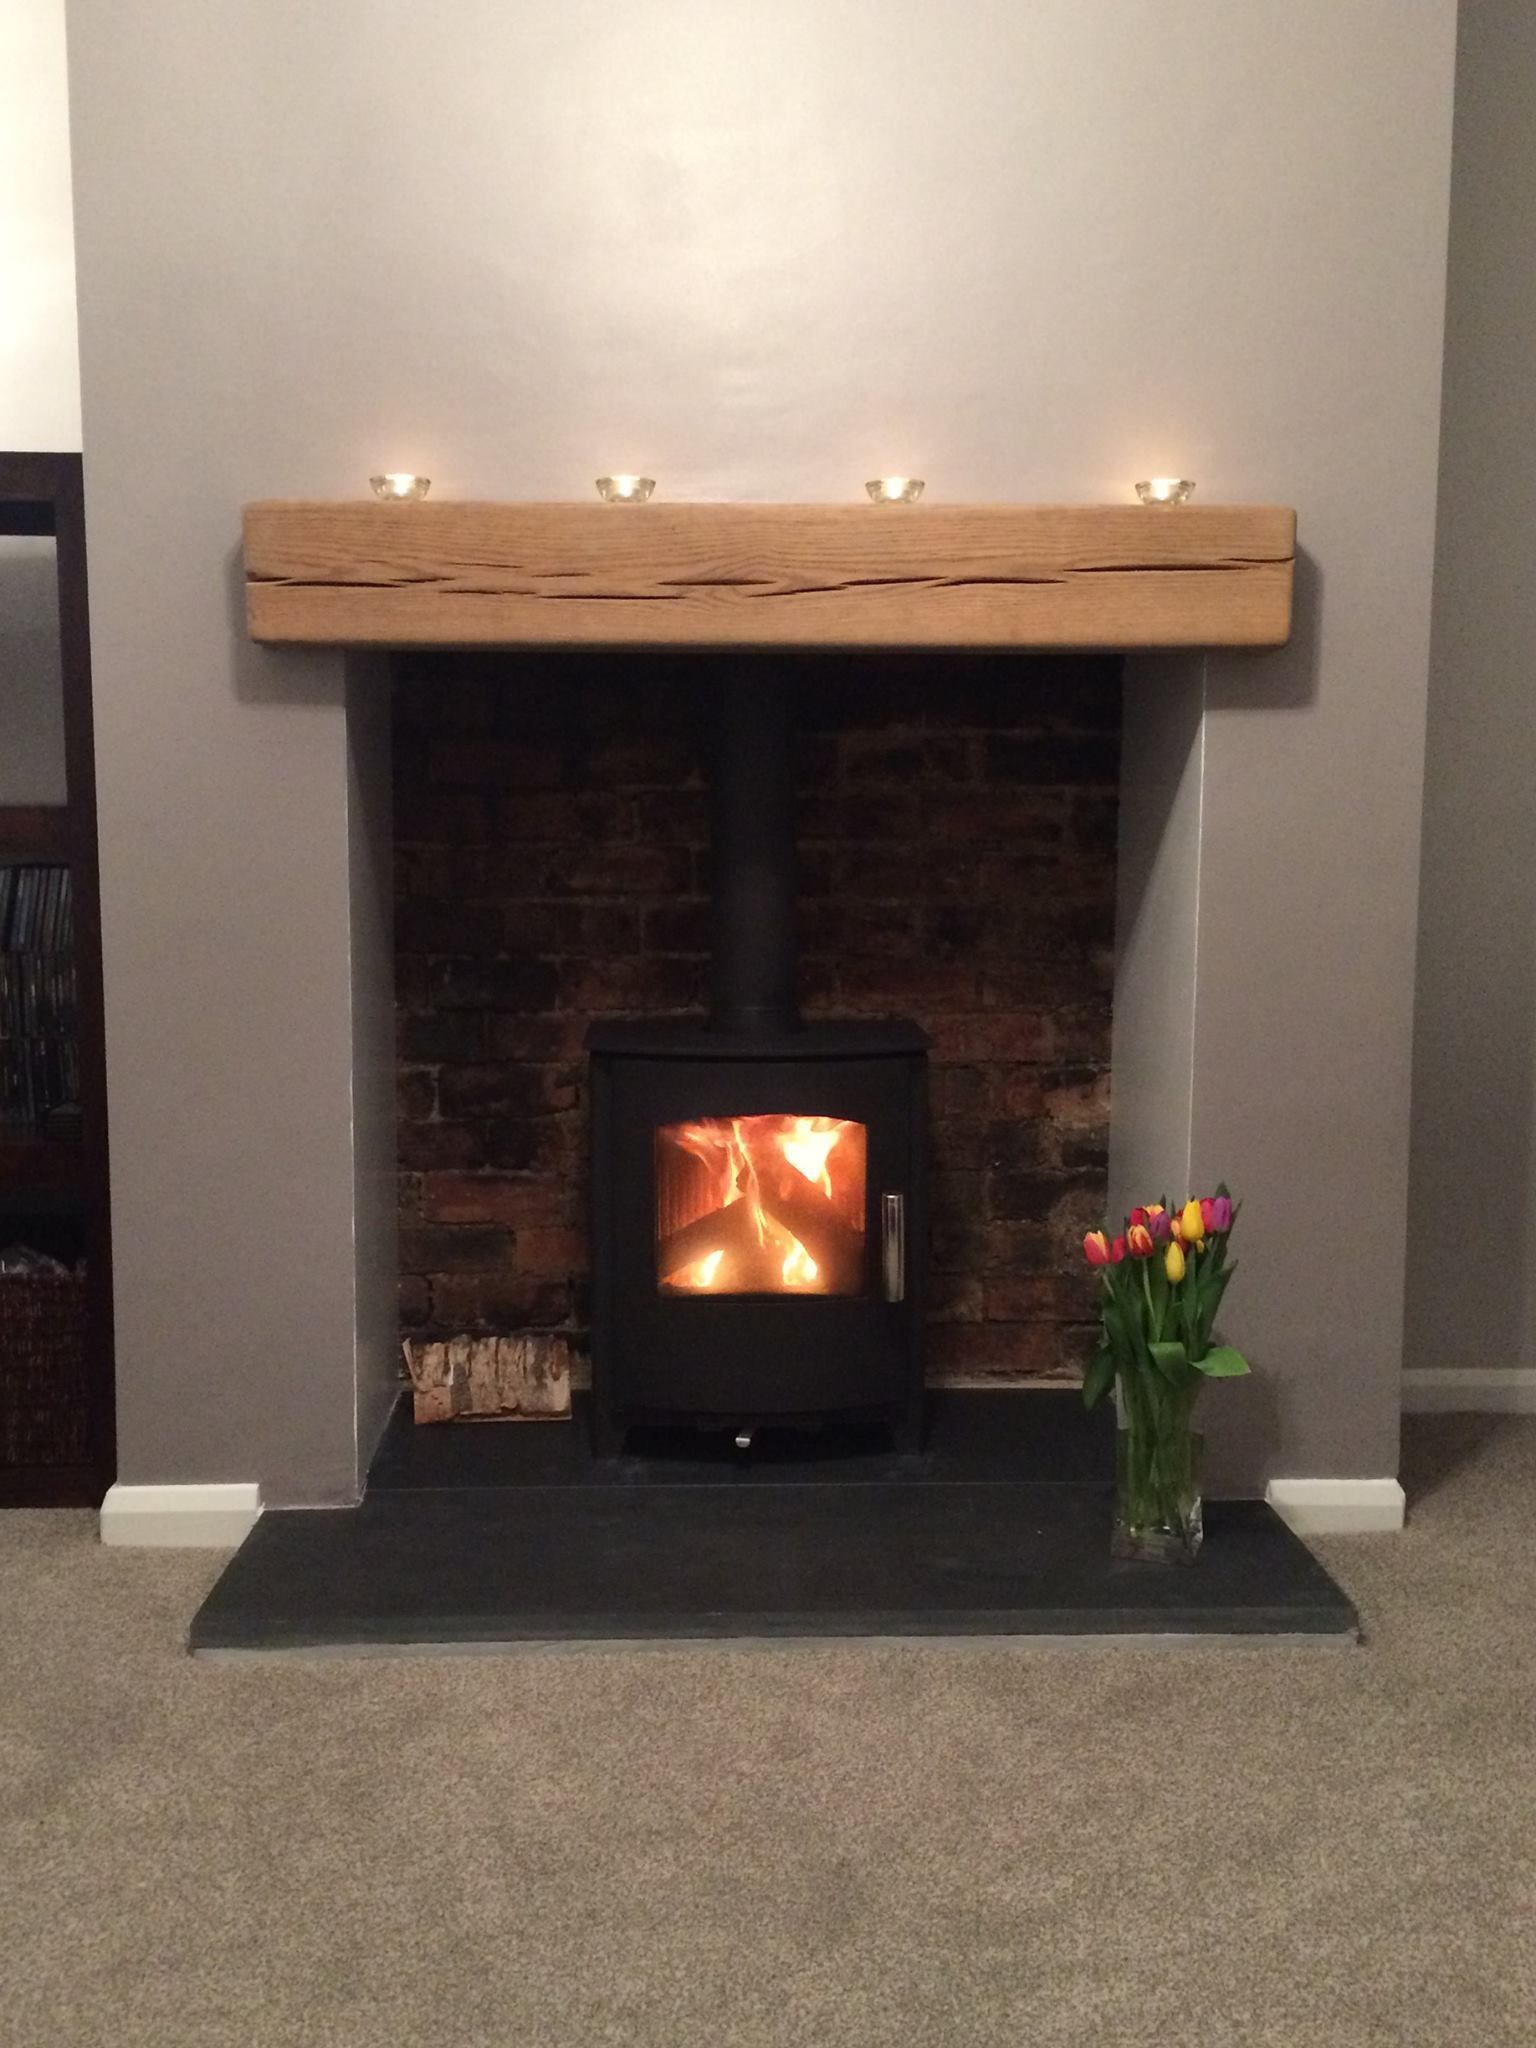 27 Stunning Fireplace Tile Ideas For Your Home Log Burner